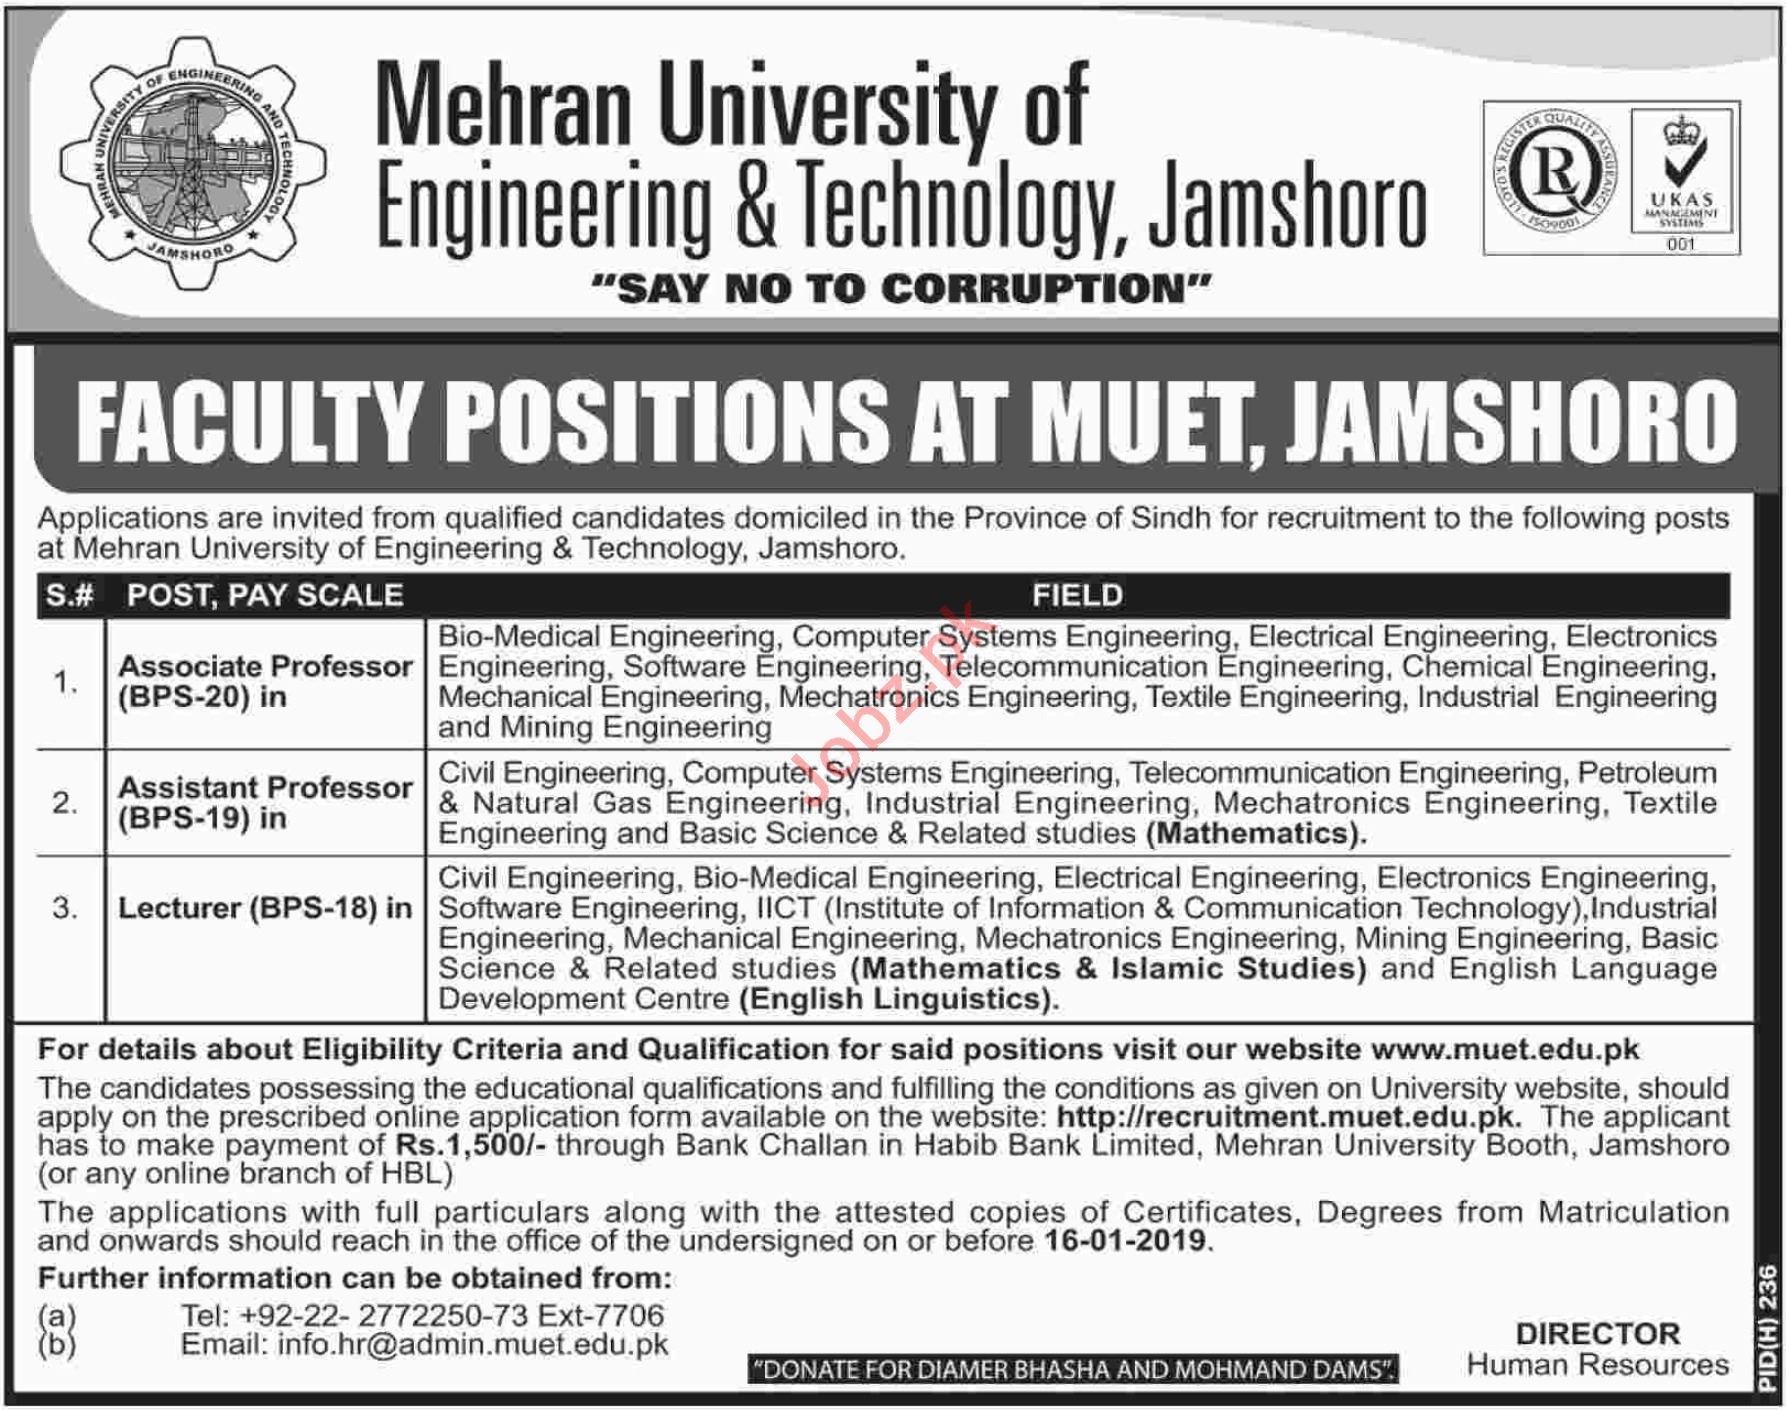 MUET University Jamshoro Jobs 2019 for Associate Professor